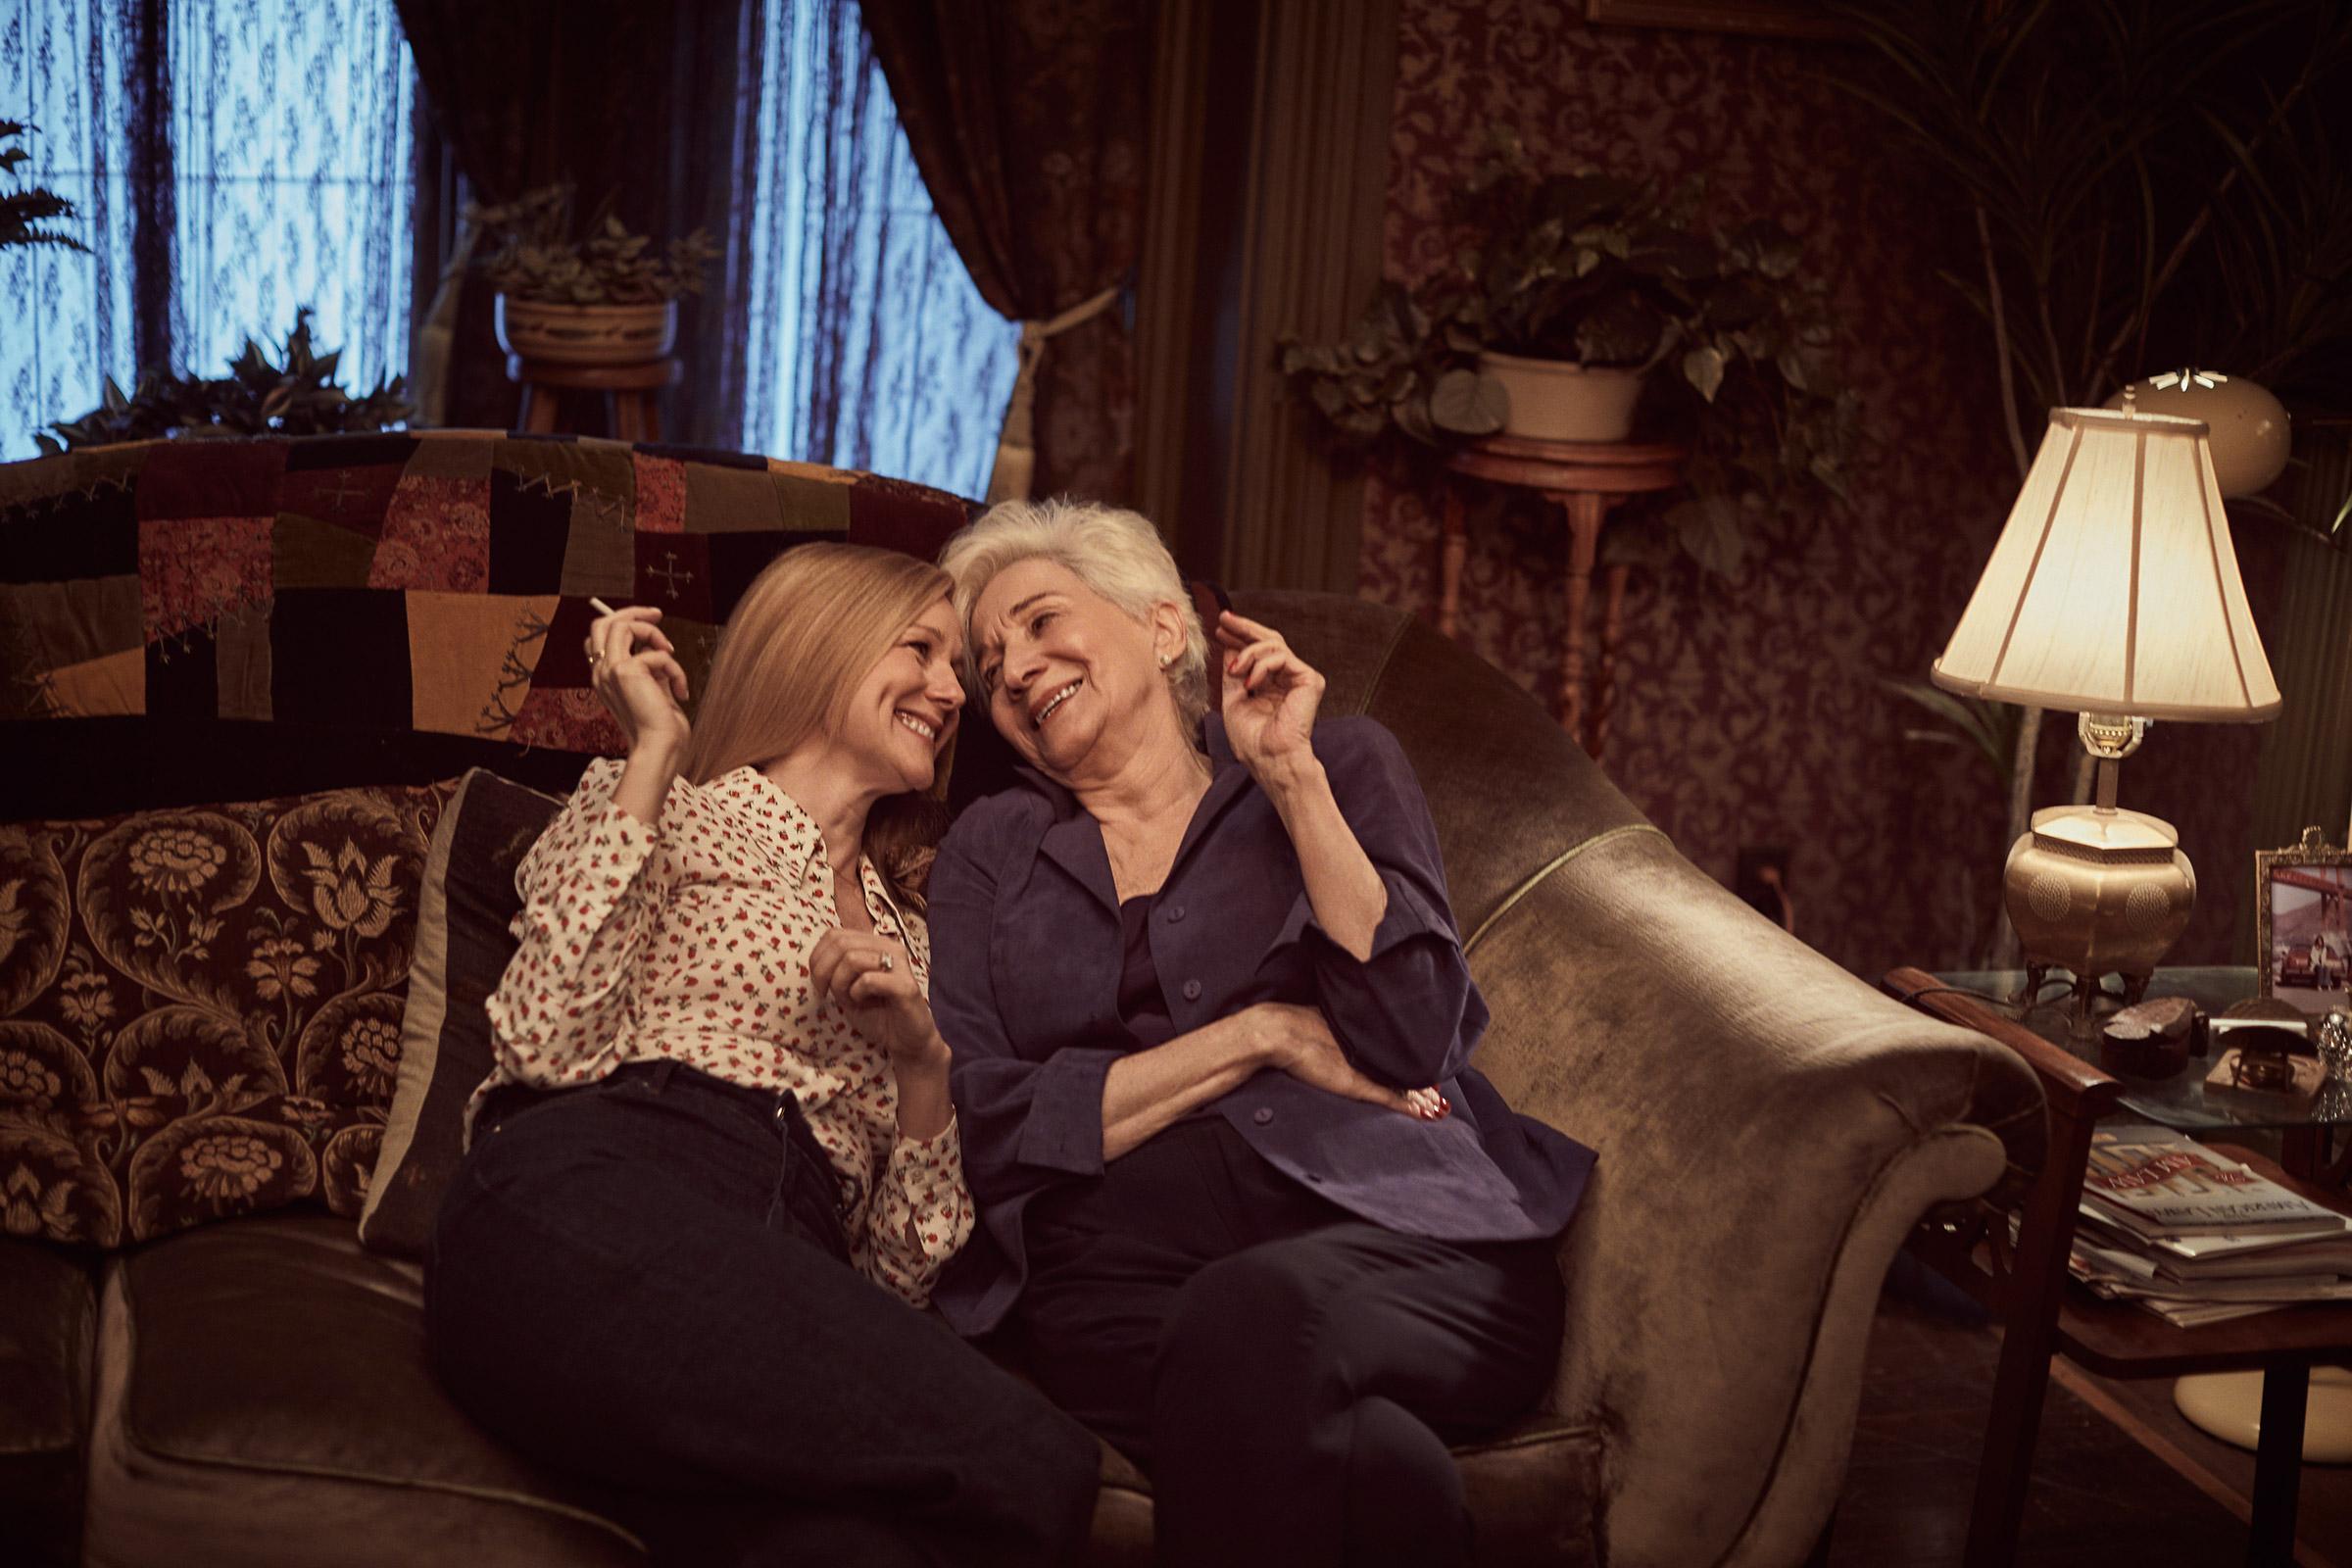 Mary Ann (Linney) and Anna (Dukakis) tell new Tales